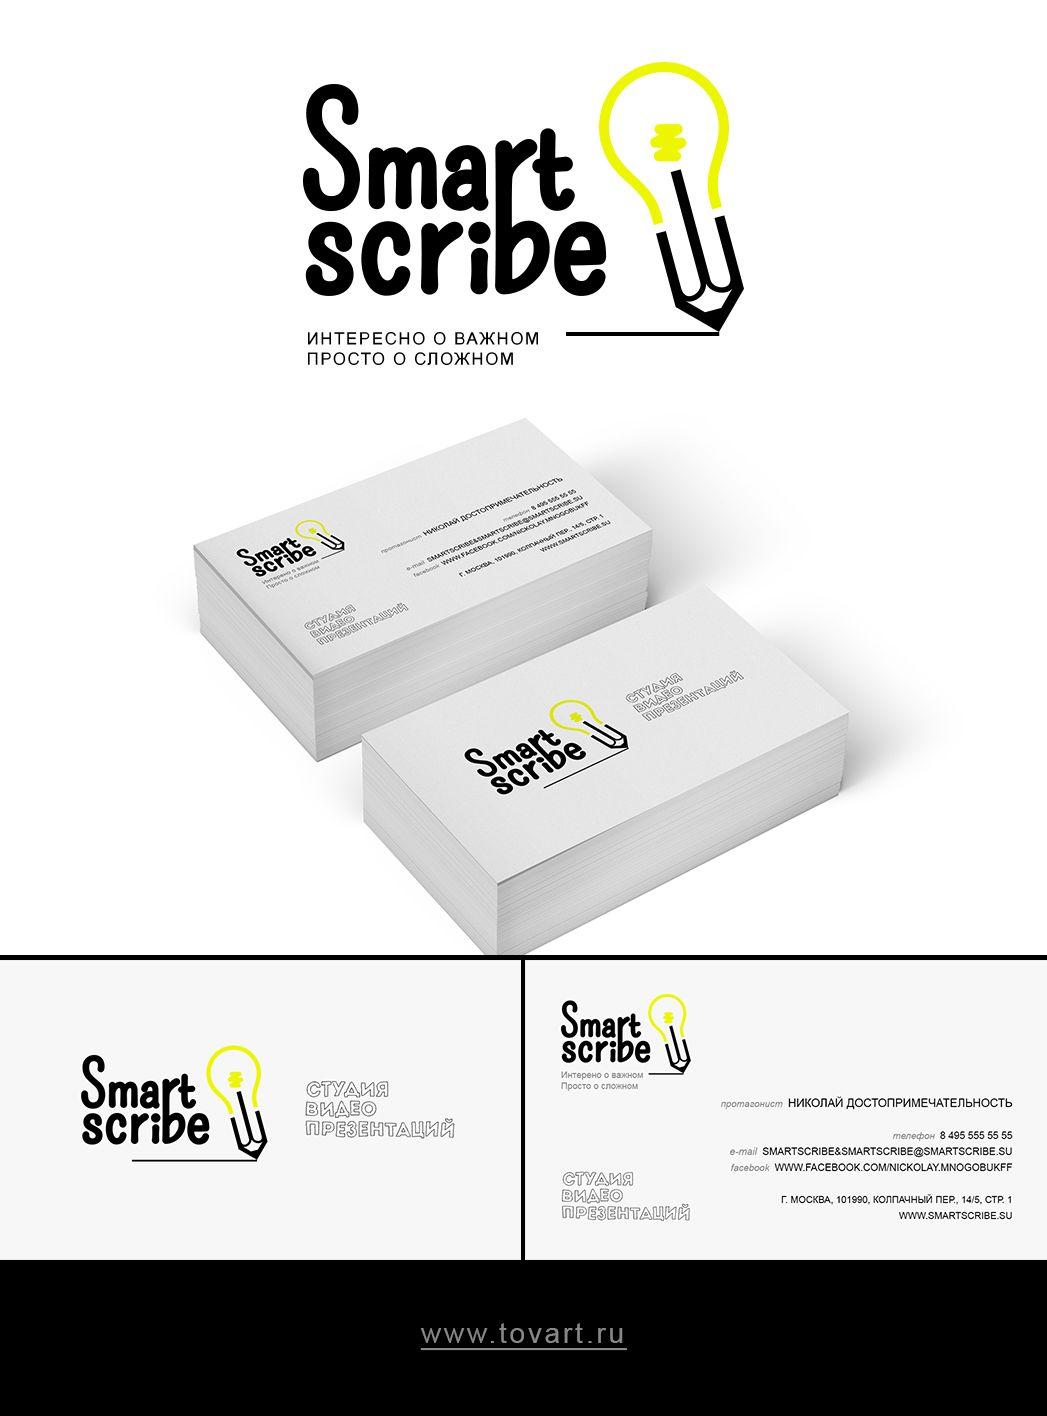 Лого, визитка и шаблон презентации для SmartScribe - дизайнер slavikx3m